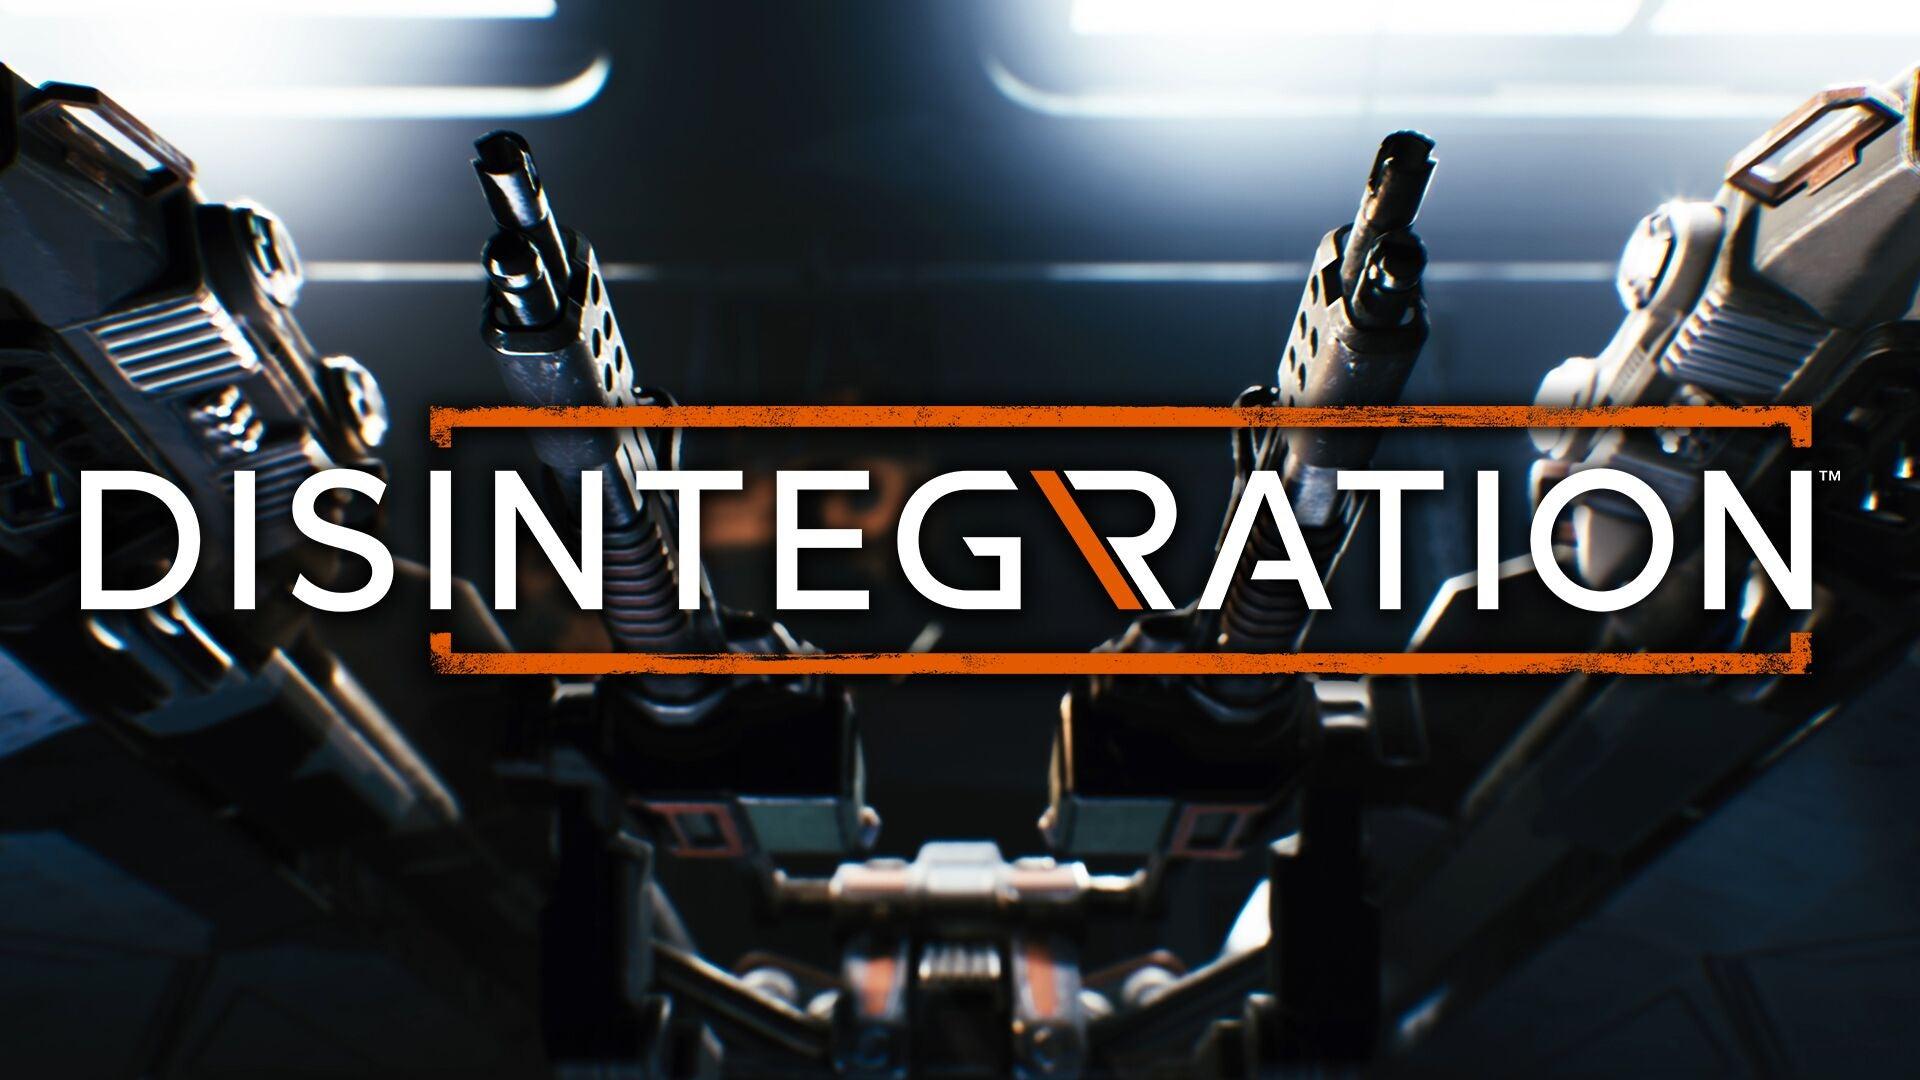 Image for Halo co-creator Marcus Lehto reveals new shooter Disintegration